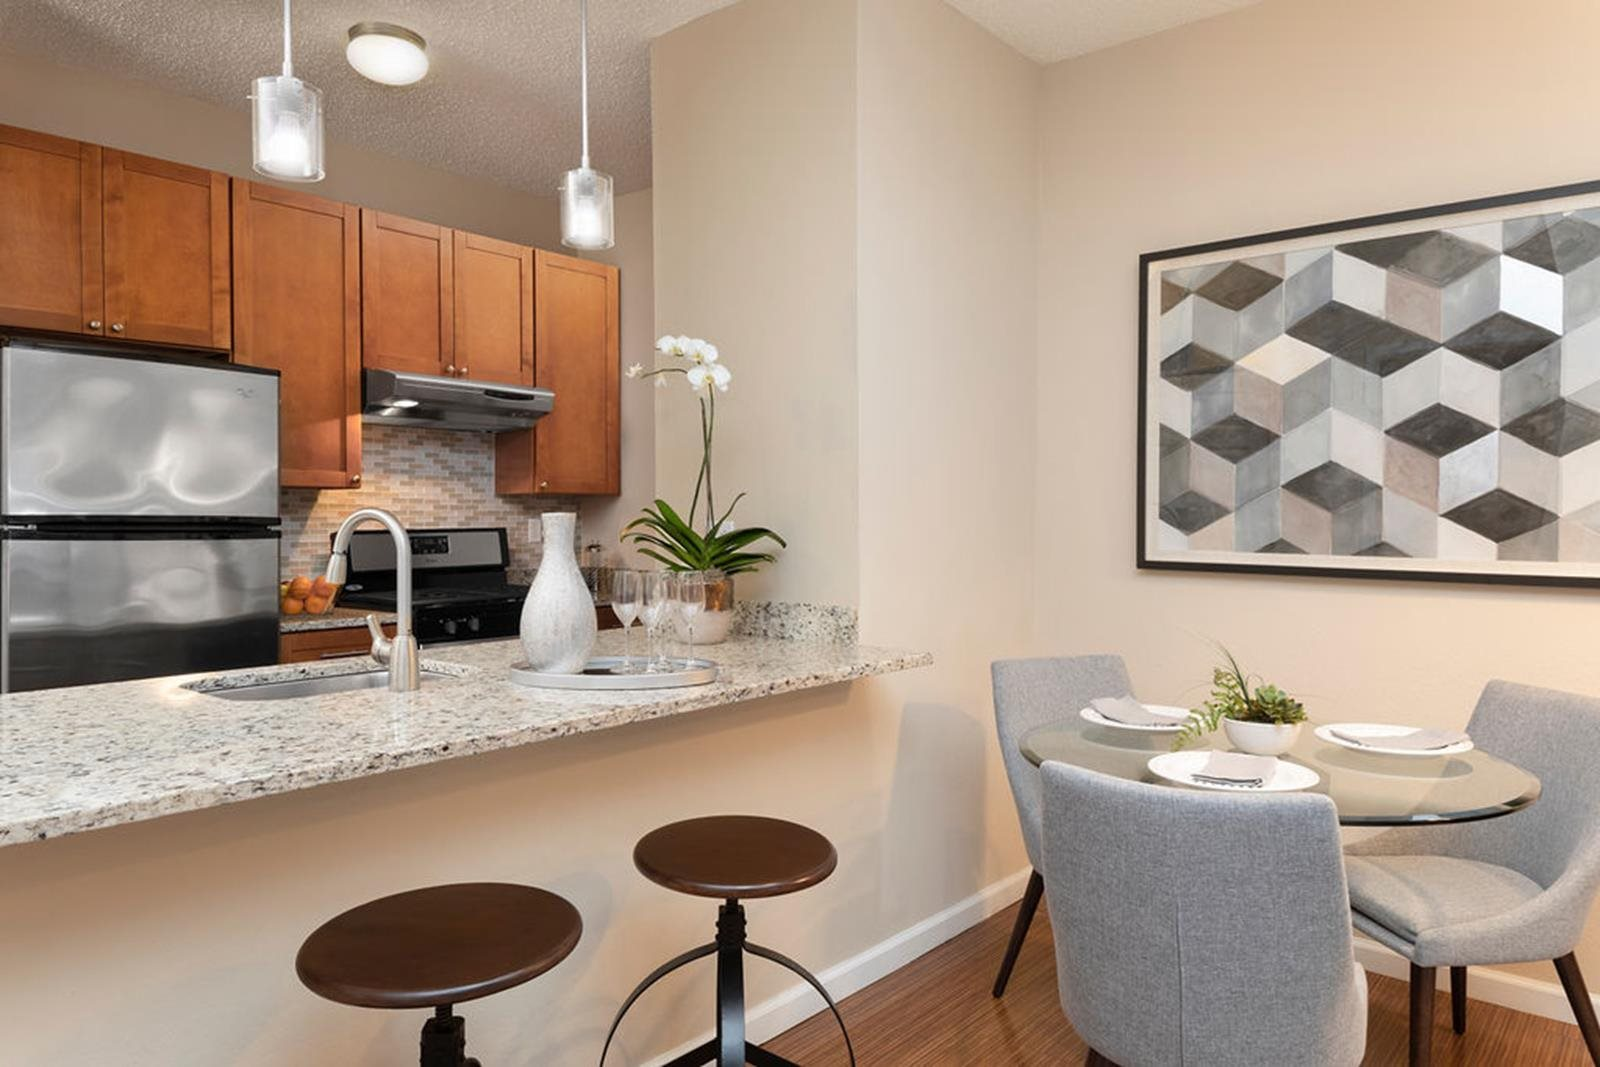 Granite Countertops In Kitchen at Parc Grove, Stamford, 06901